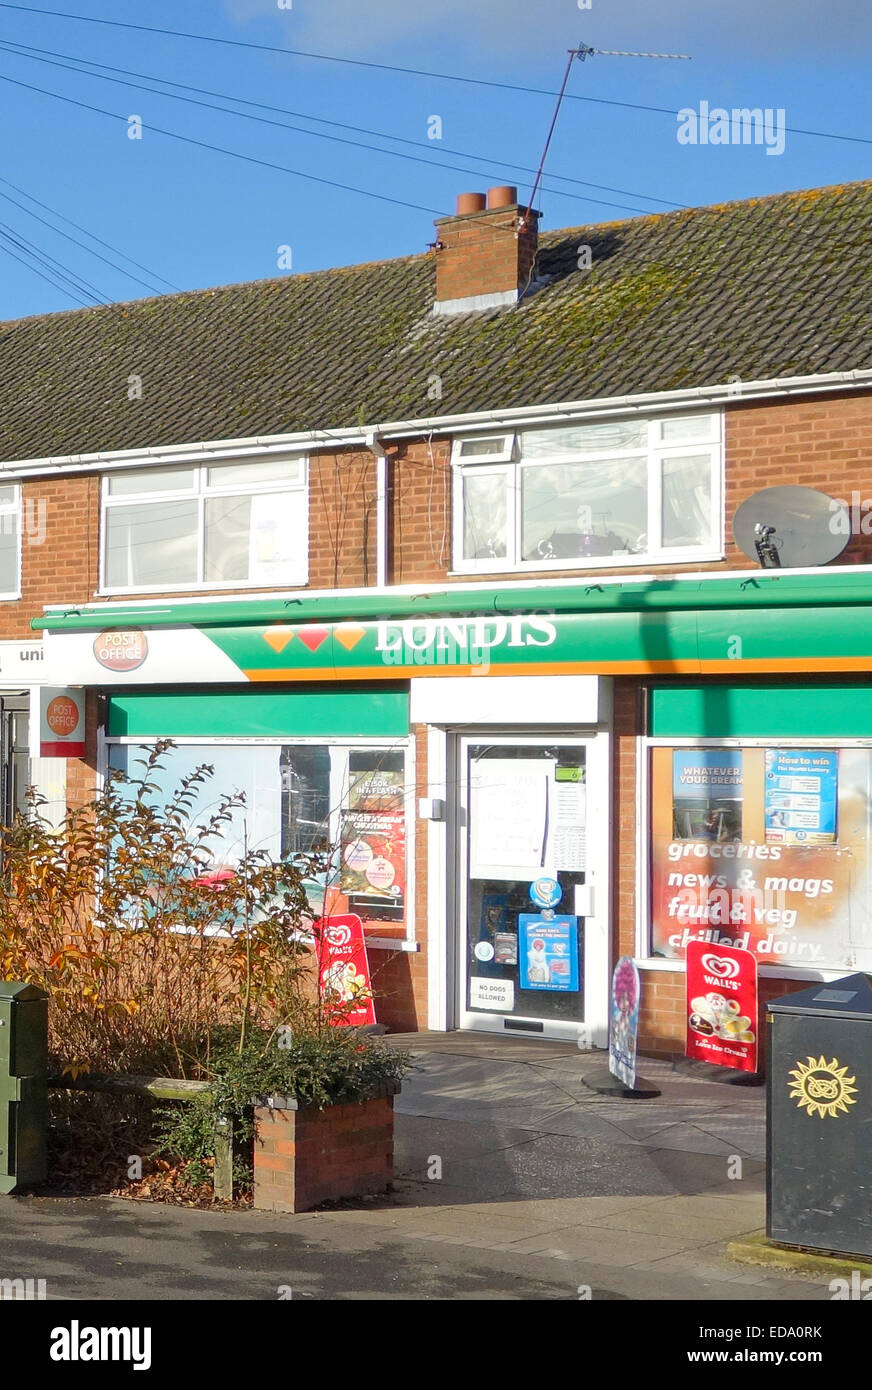 Londis Convenience Store, Swindon Village, Staffordshire, England, UK - Stock Image